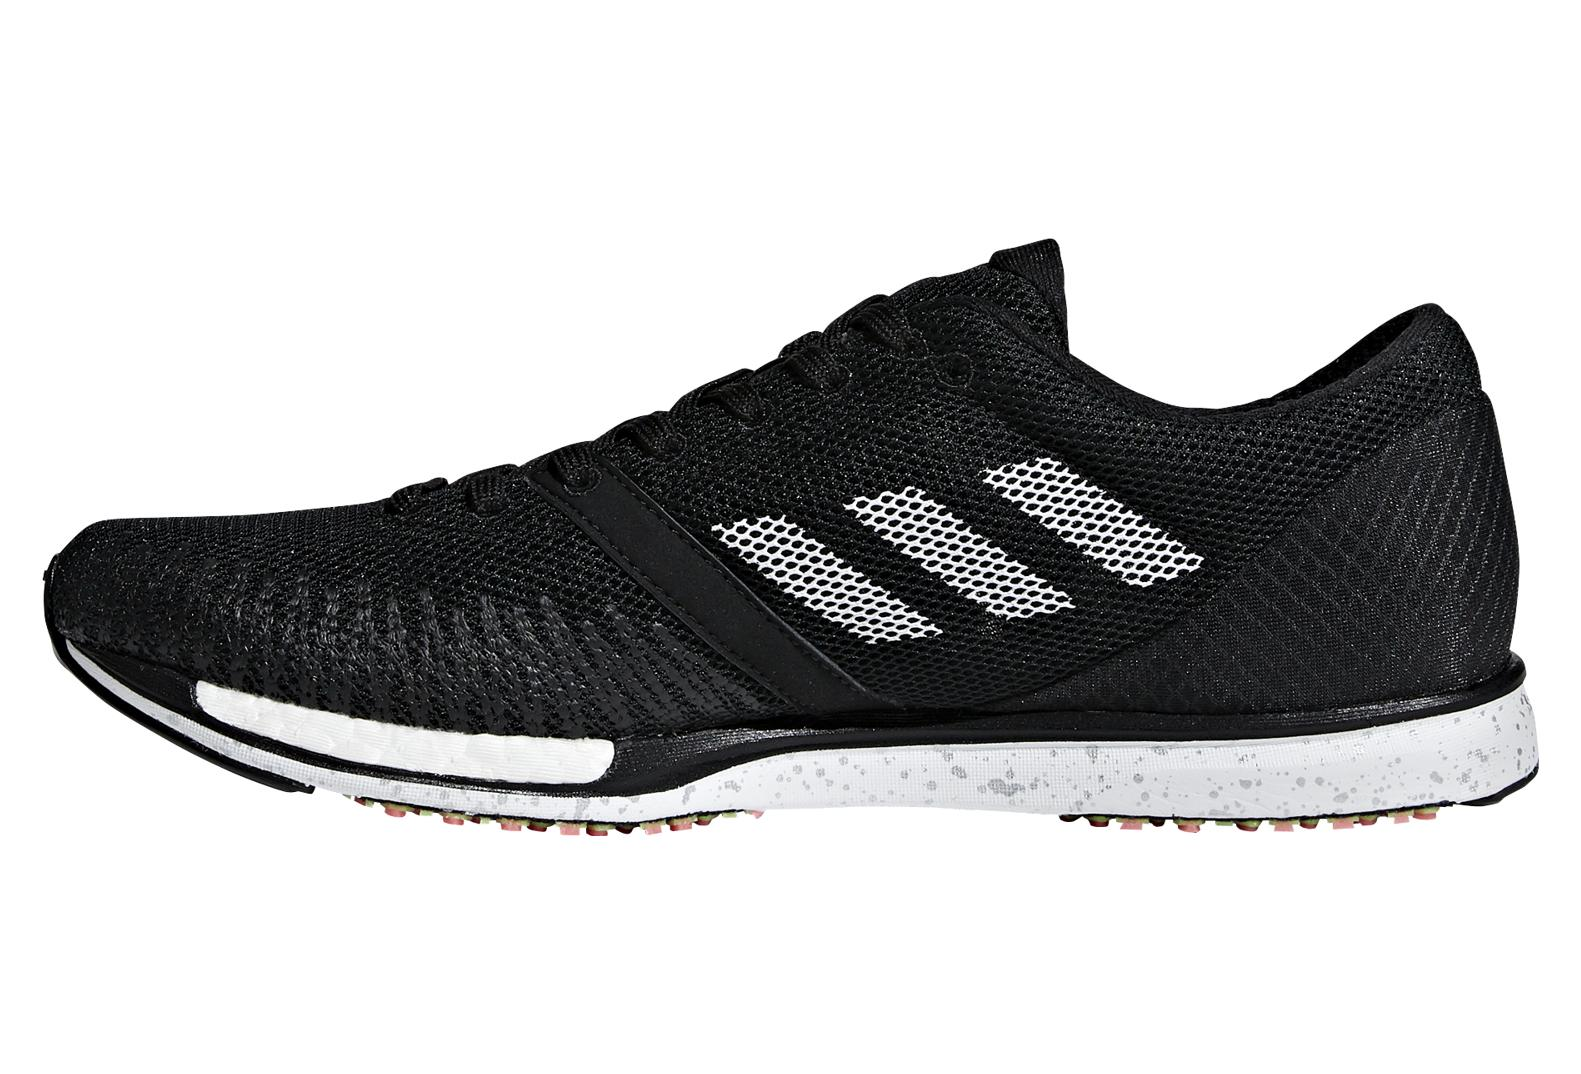 atleta idioma cavidad  Adidas ADIZERO TAKUMI SEN 5 Shoes Black | Alltricks.com